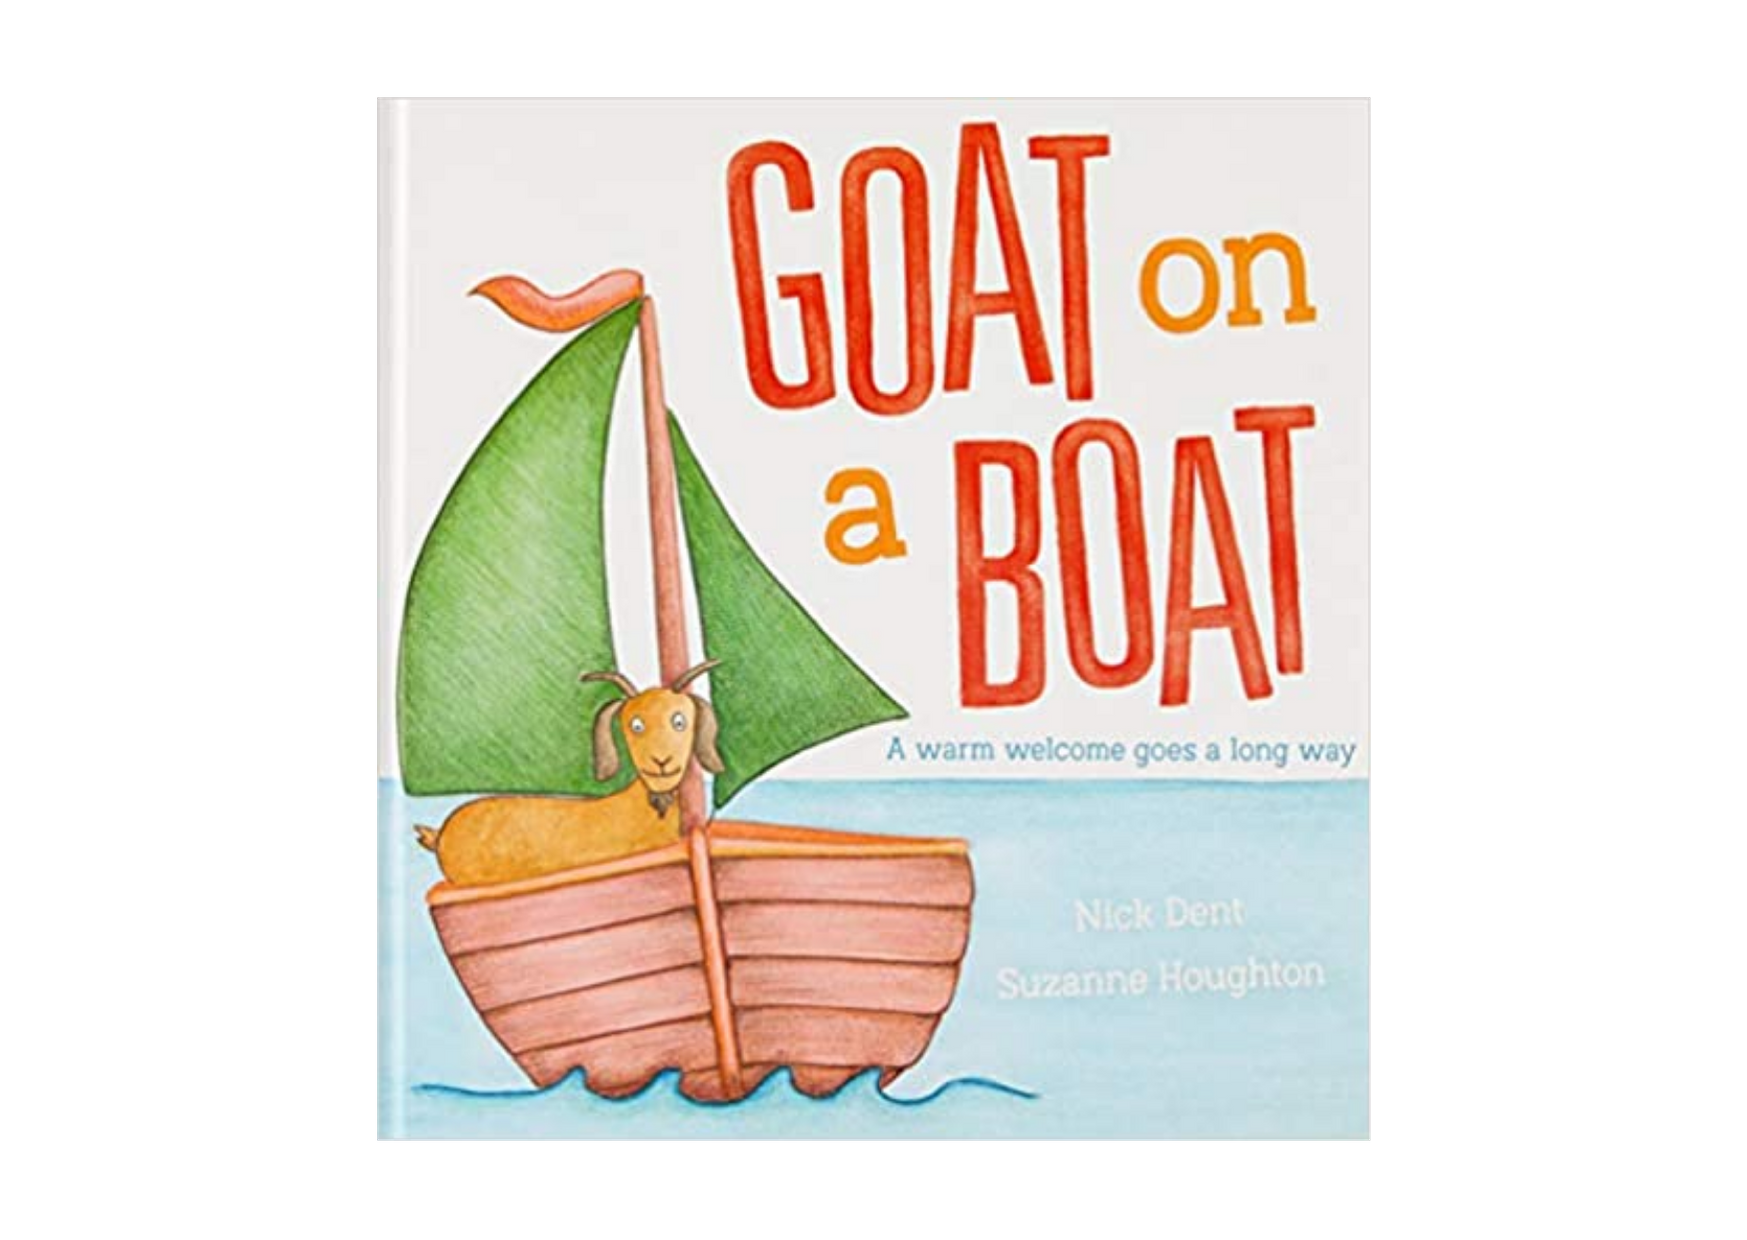 Omnibus Books - Goat on a Boat